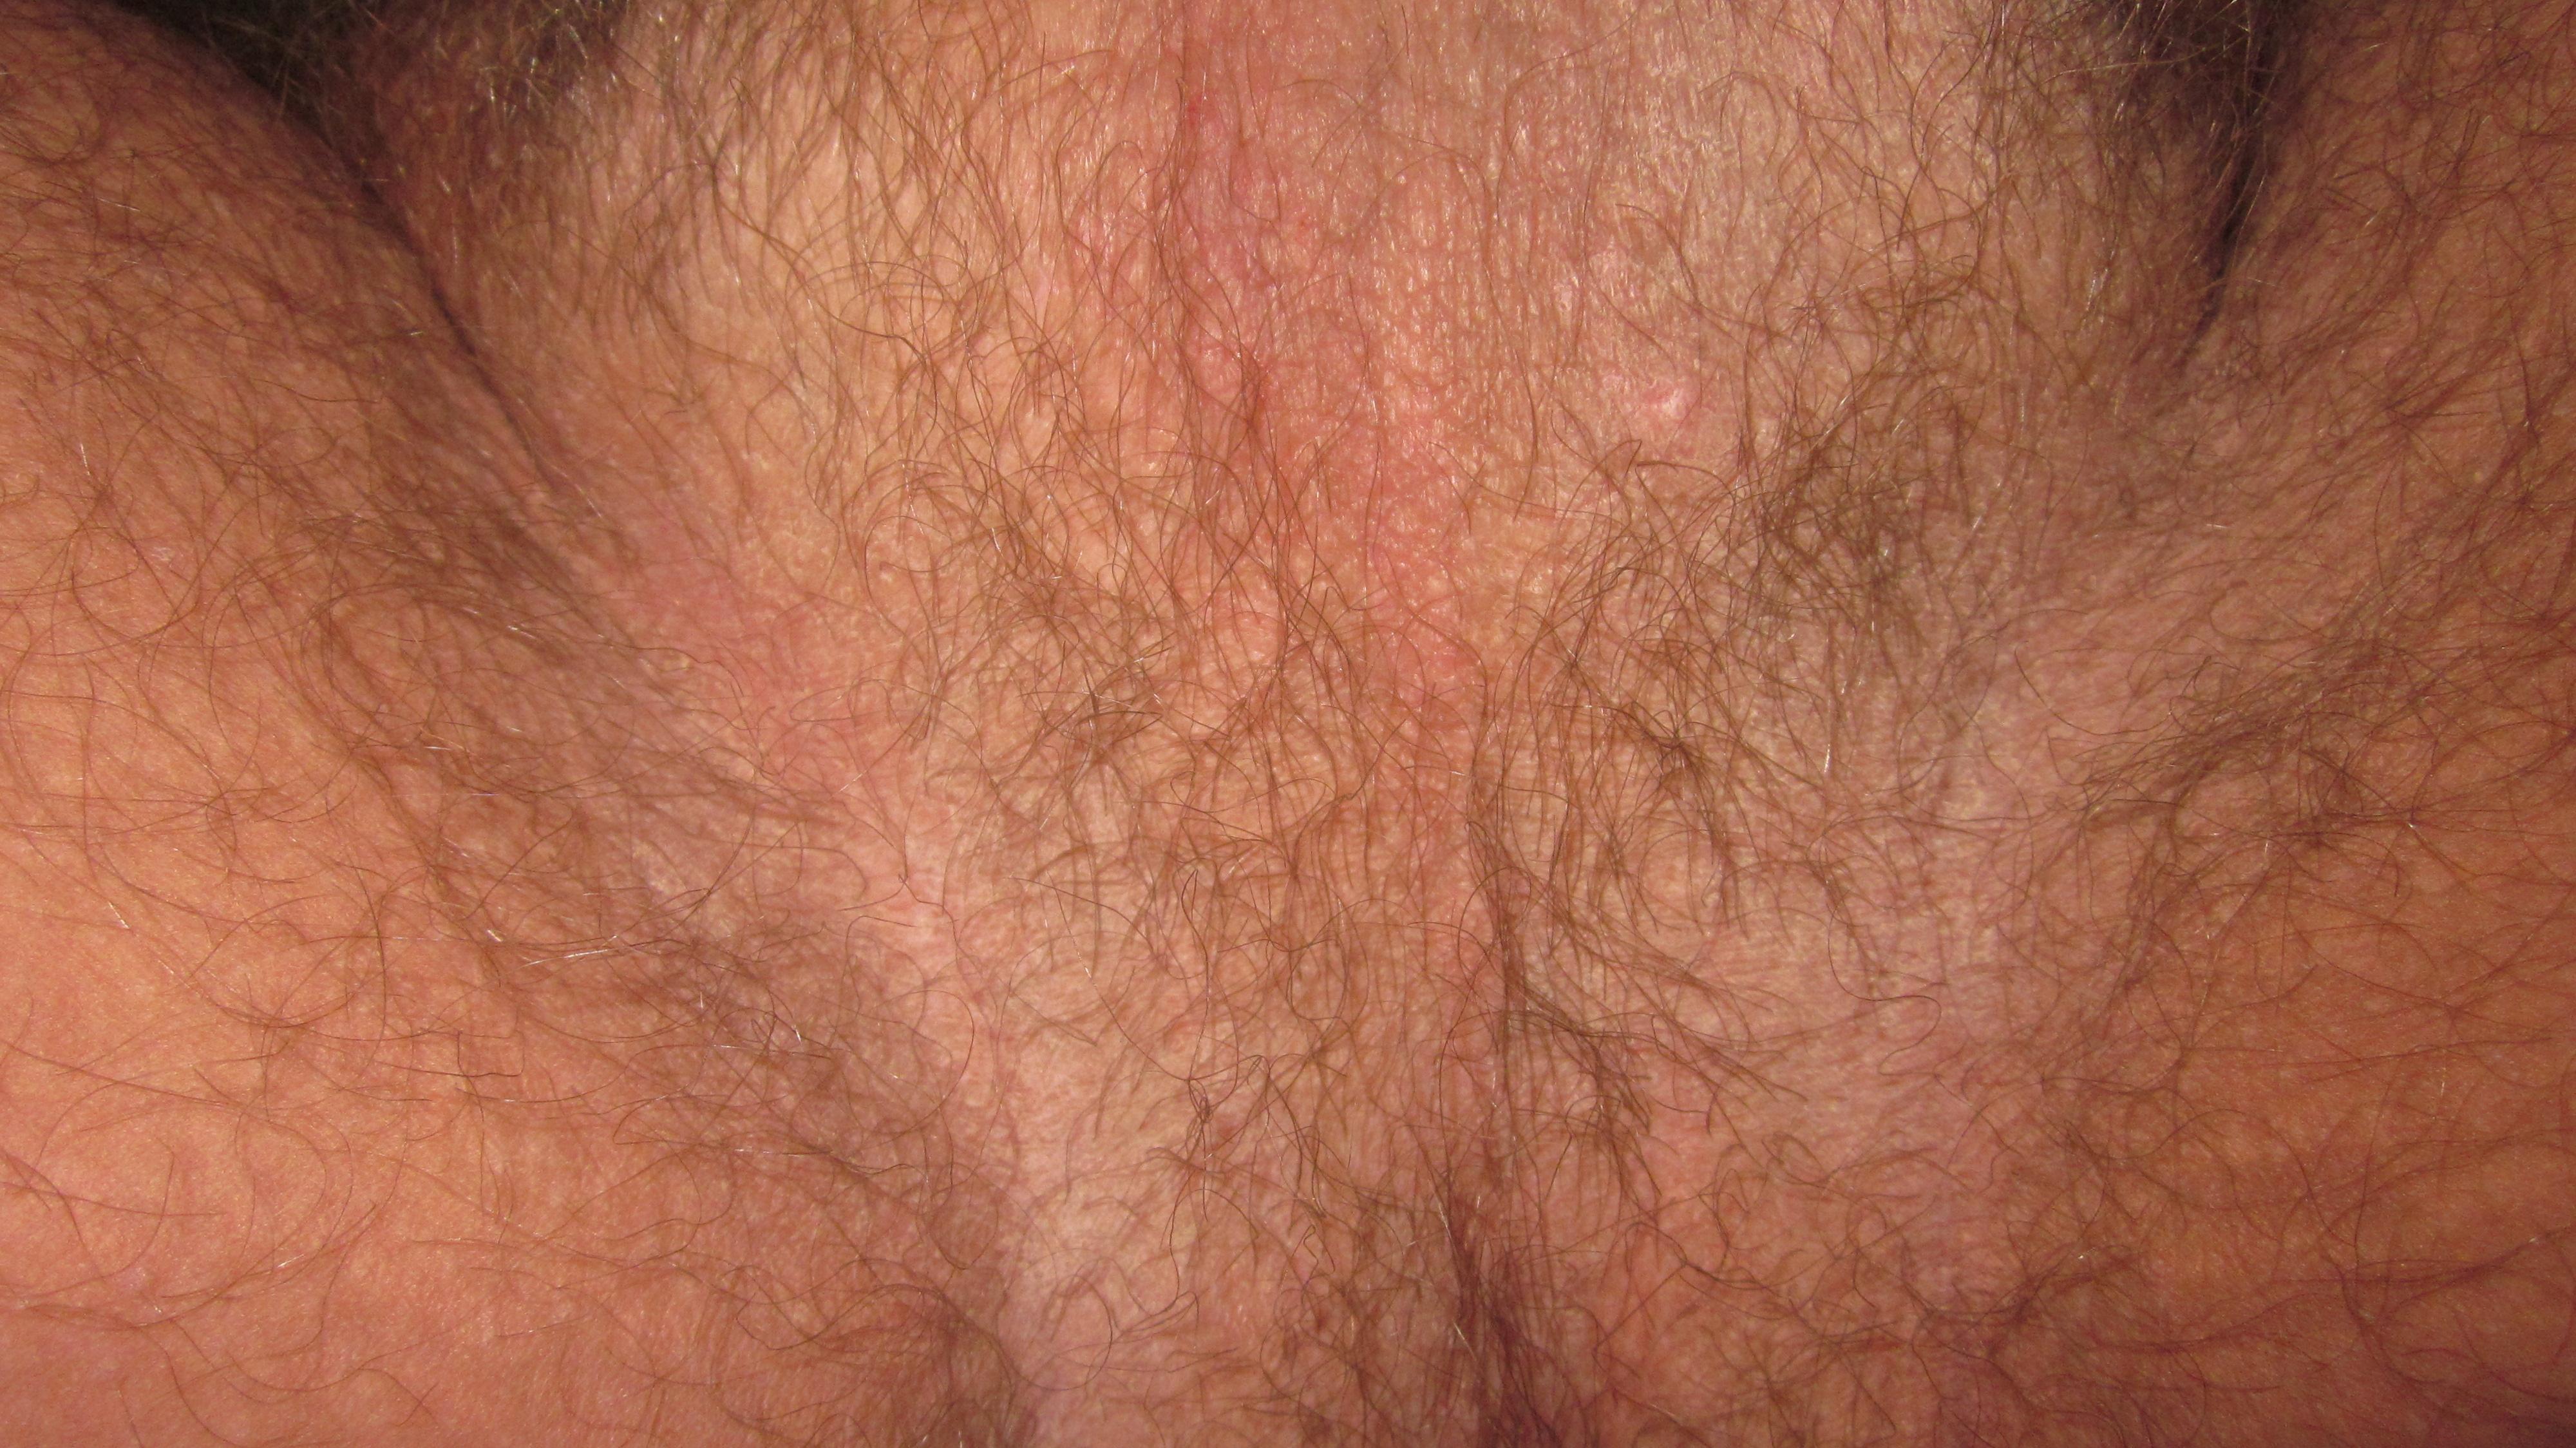 itchy scrotum eczema - MedHelp